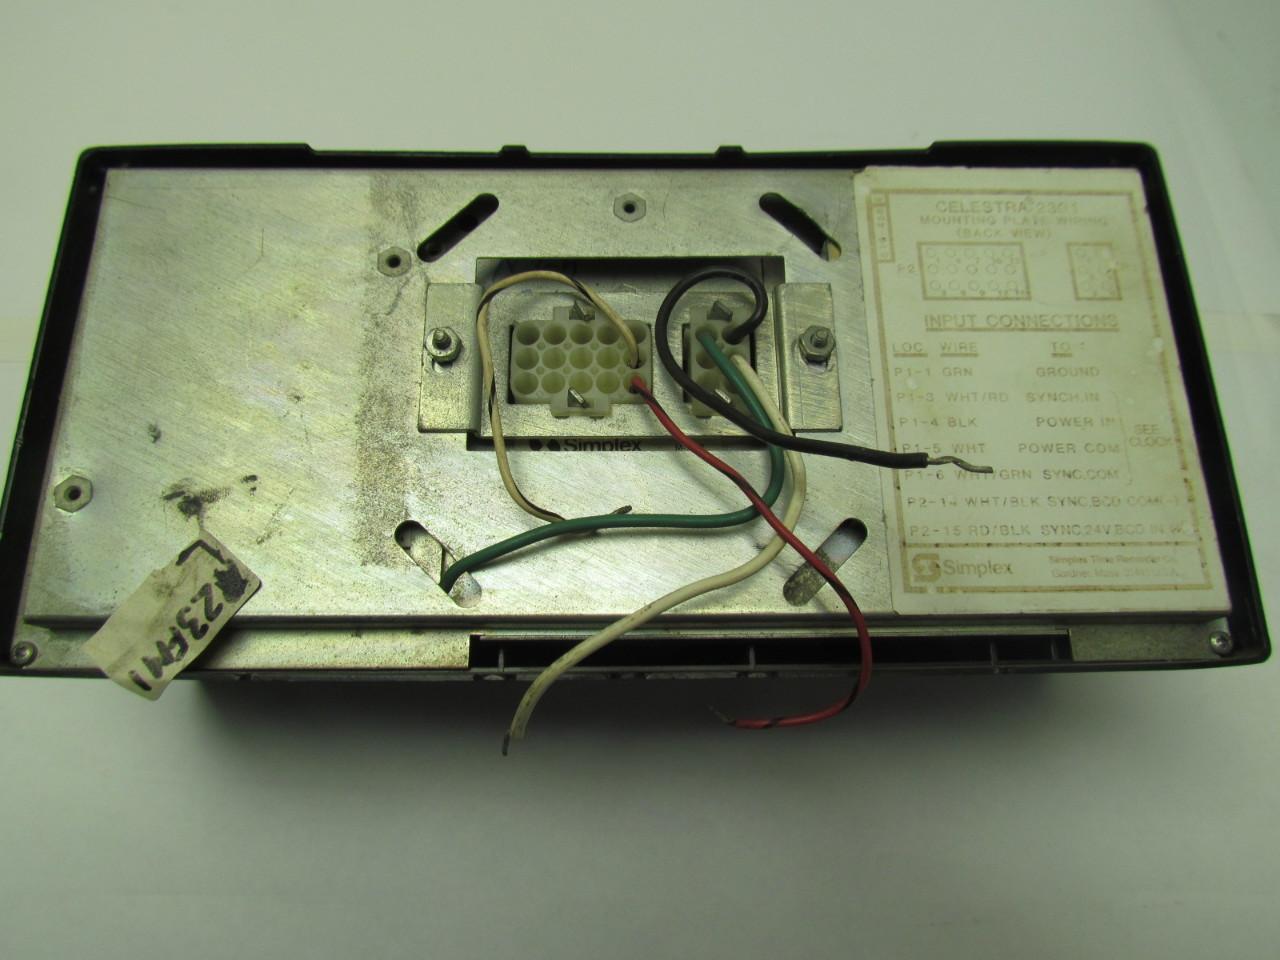 simplex celestra 2301 time recorder digital clock display 120v Simplex Clock Wiring simplex celestra 2301 time recorder digital clock display 120v 2amp 60hz simplex clock wiring